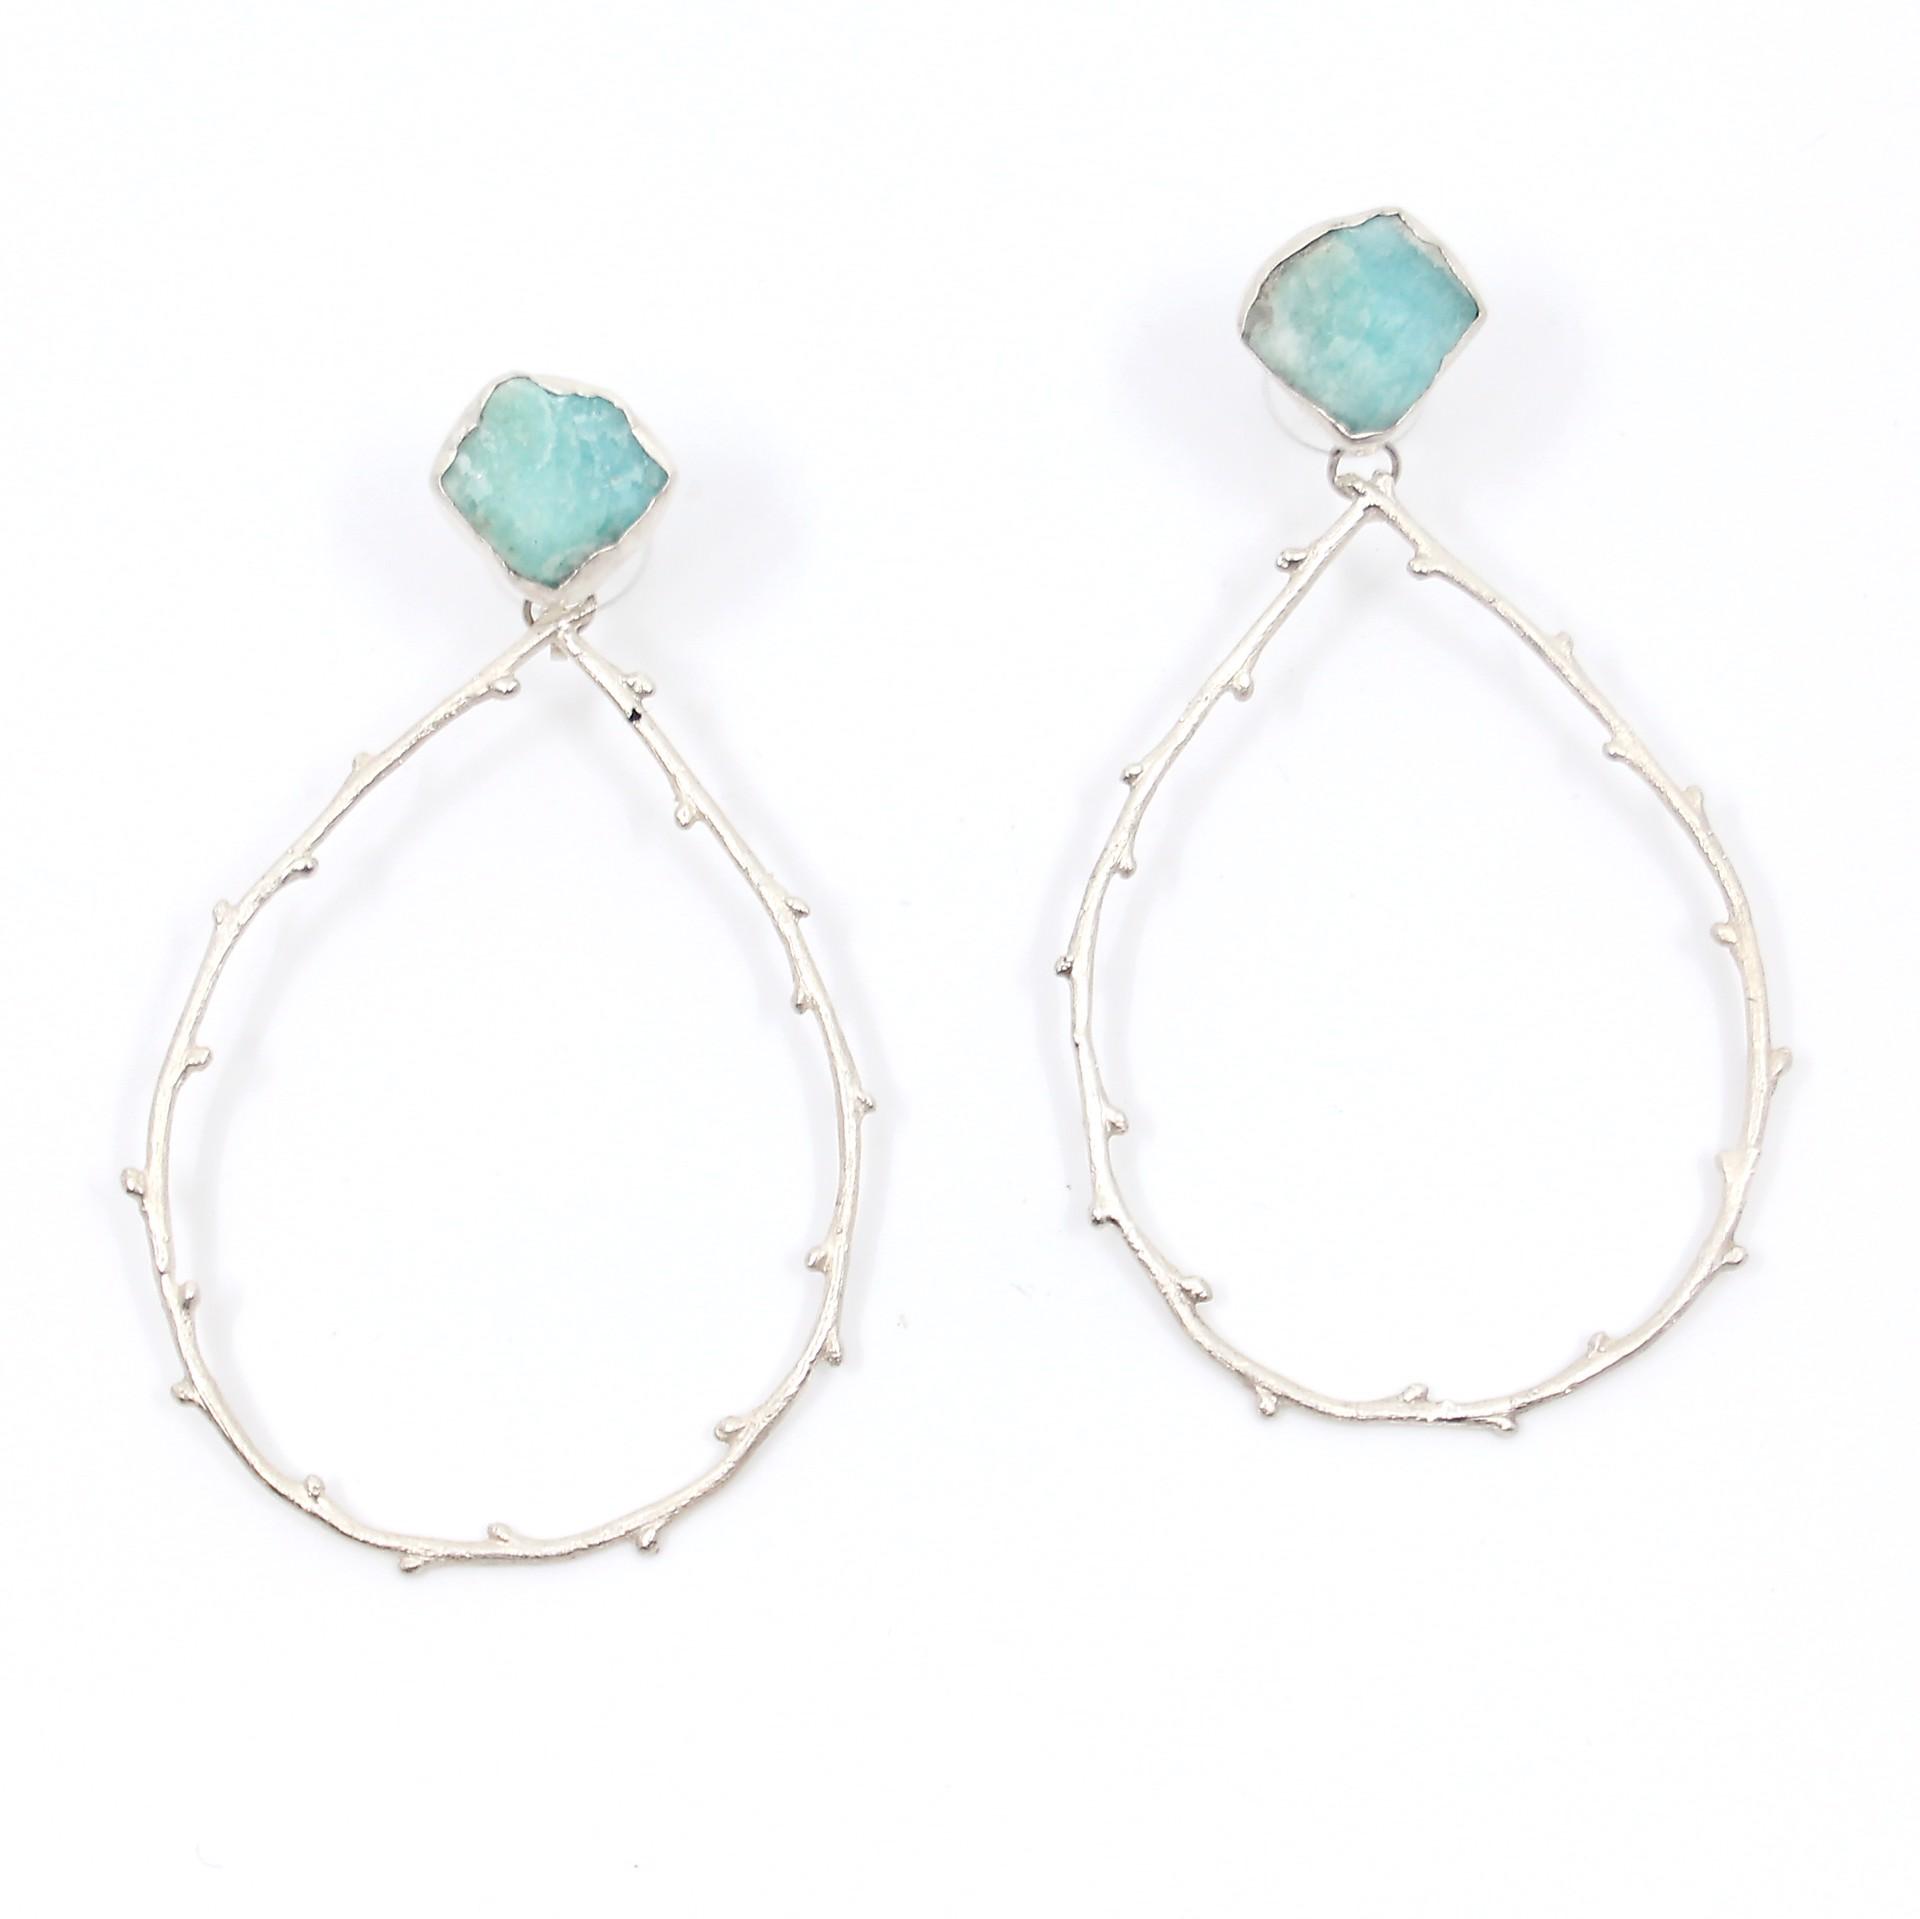 Amazonite Tetra Earrings by Anna Johnson